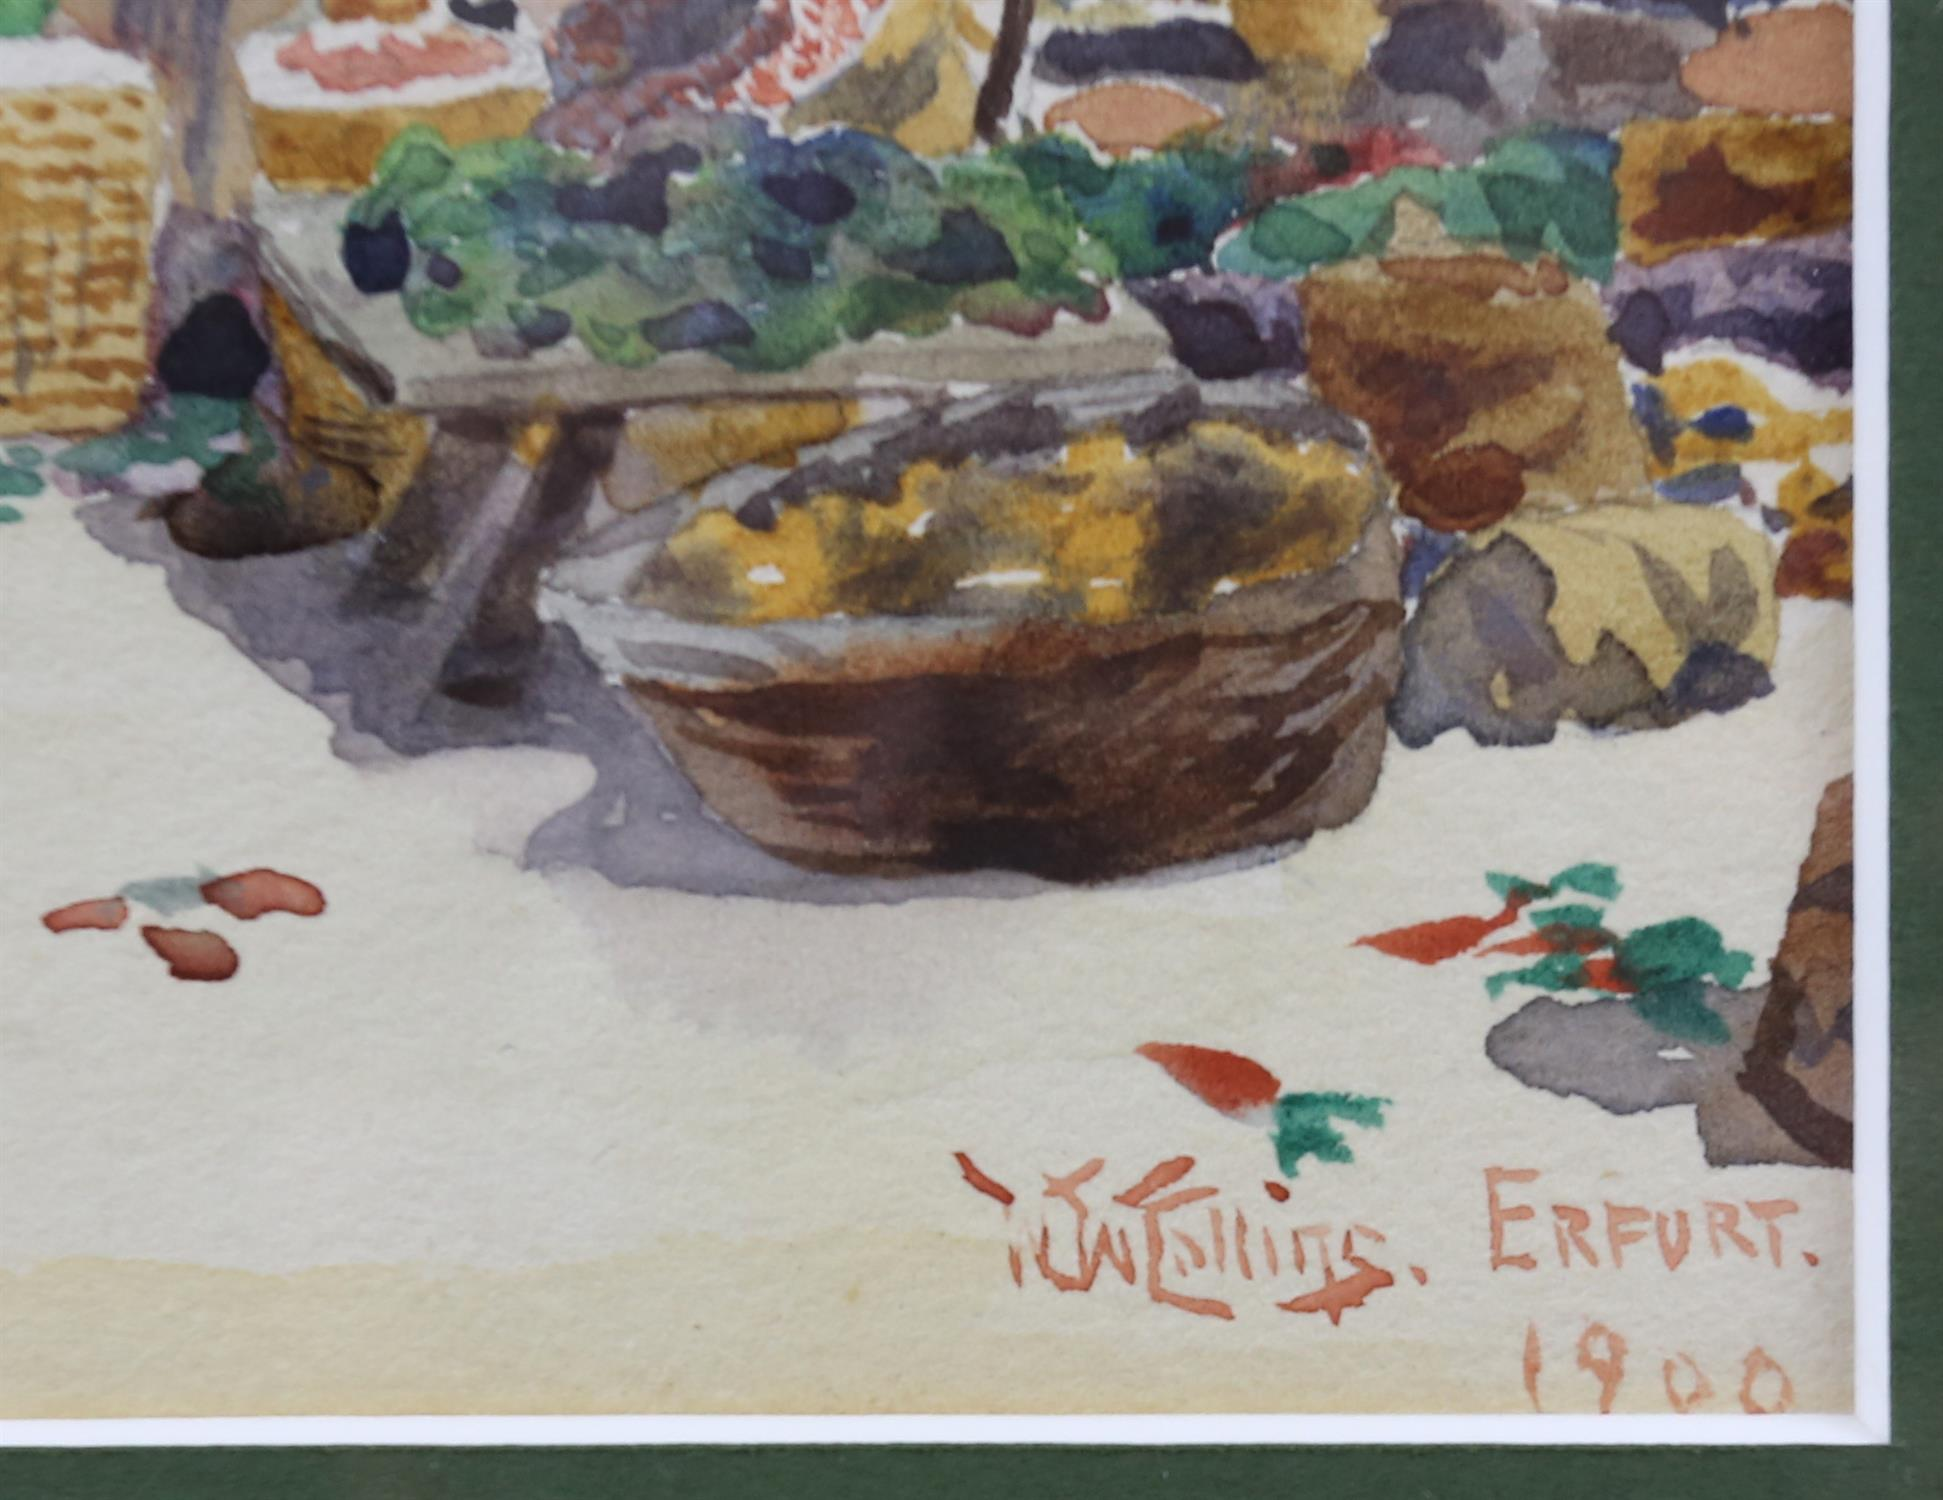 William Wiehe Collins, British 1862-1951, 'Erfurt', market scene, signed and dated 1900, - Image 3 of 4